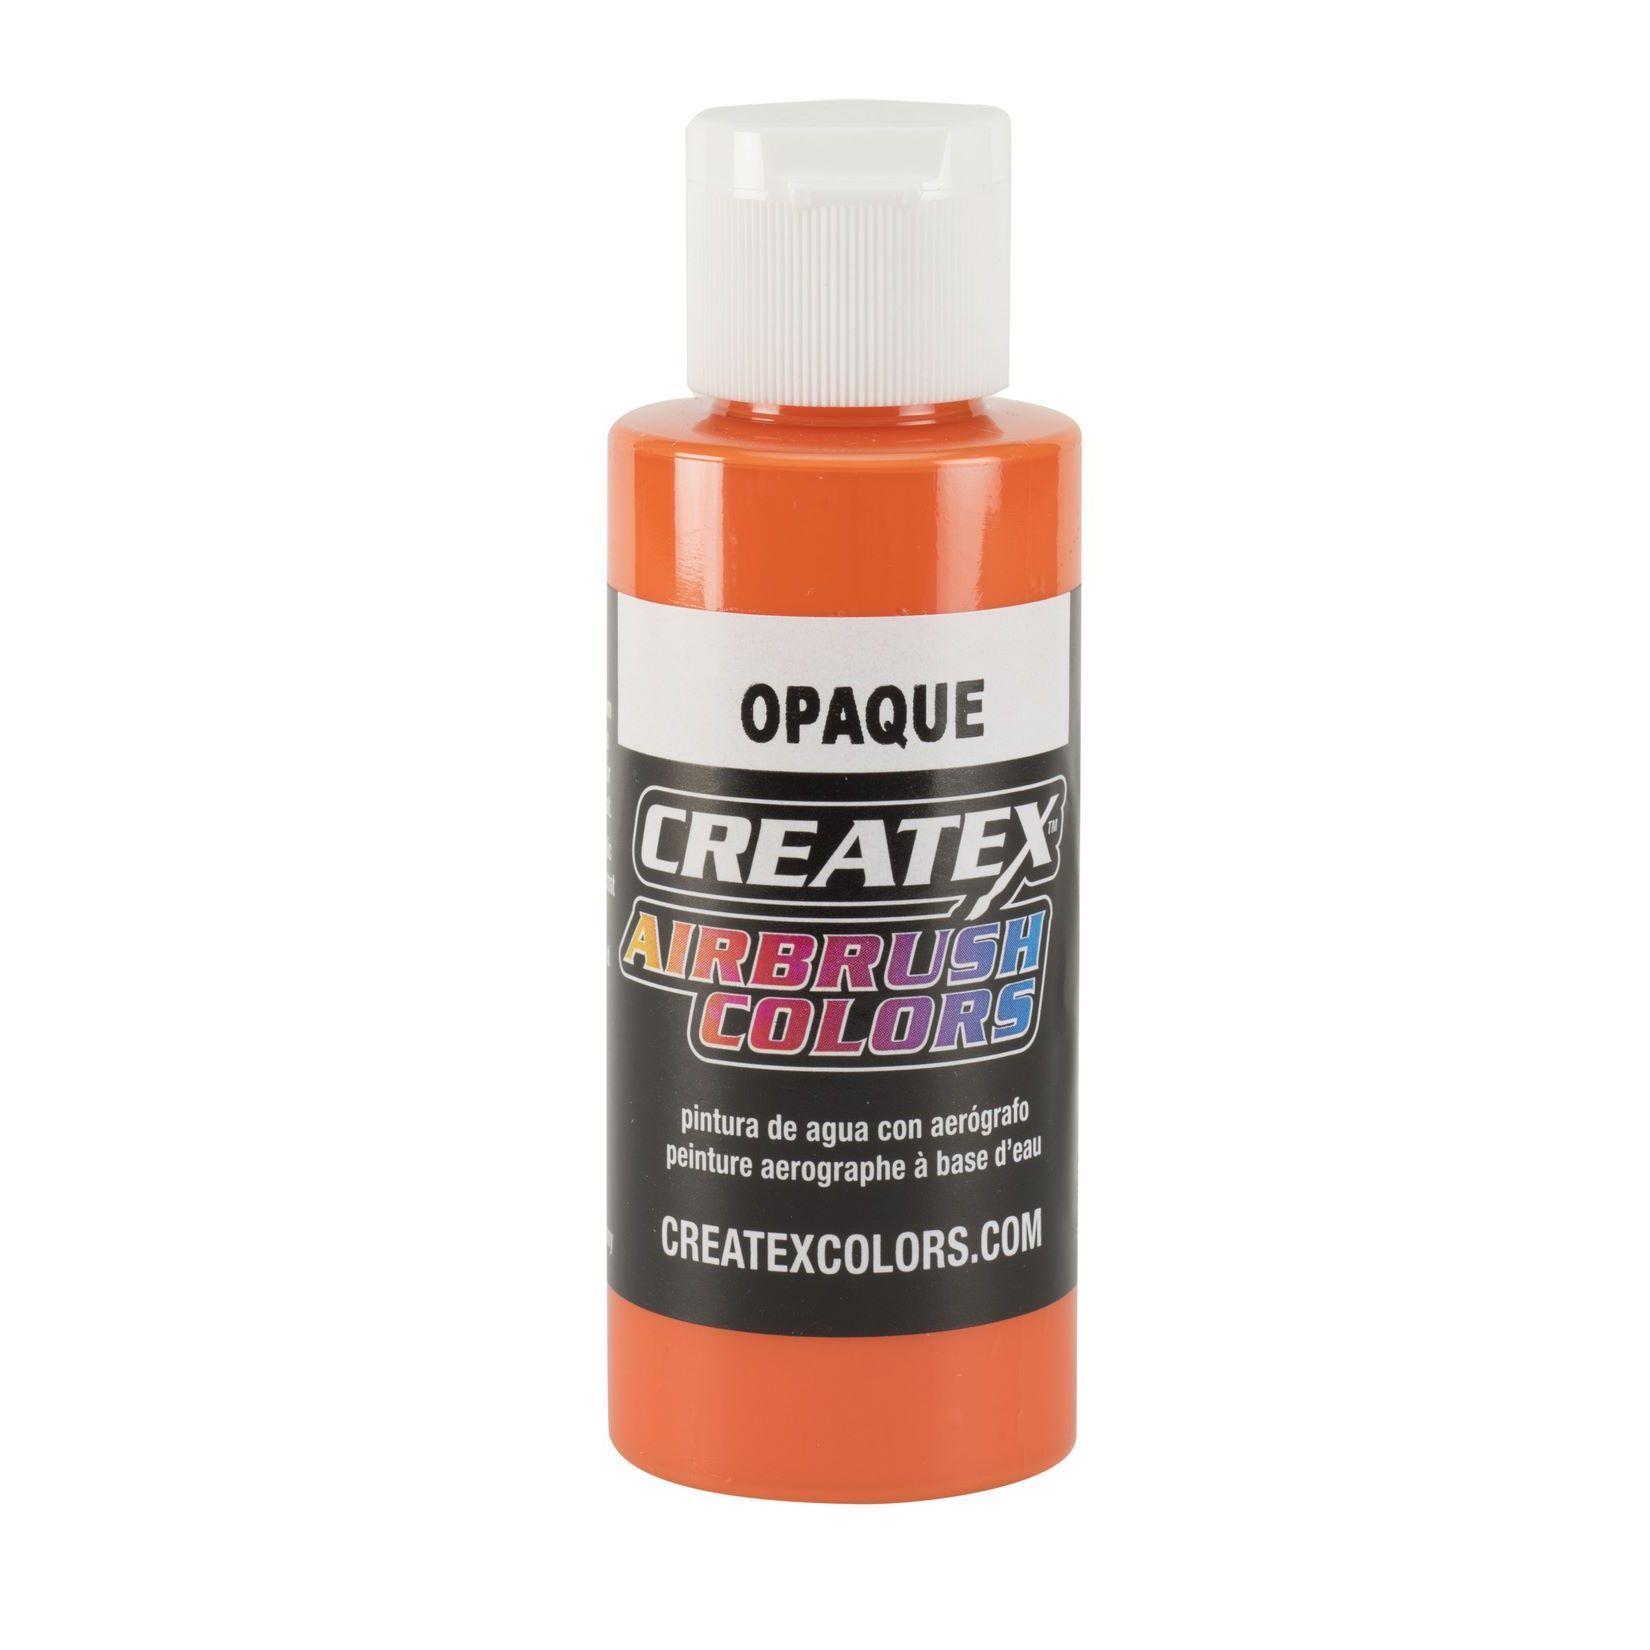 opaque Korallenrot Createx Airbrush Colors Farbe 240ml 13 5208 Createx